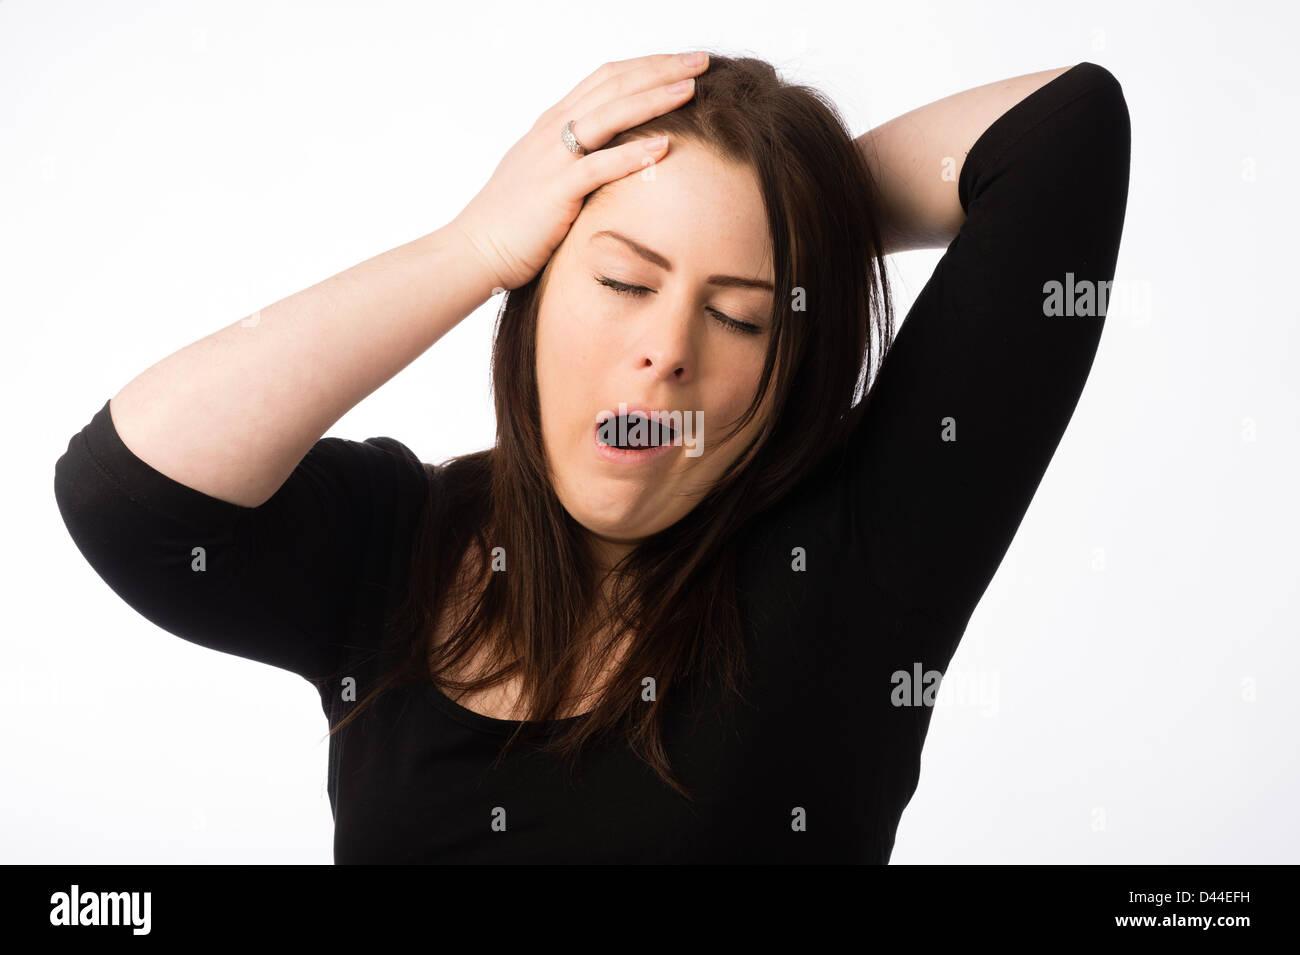 A young tired sleepy yawning woman, brown hair, UK - Stock Image